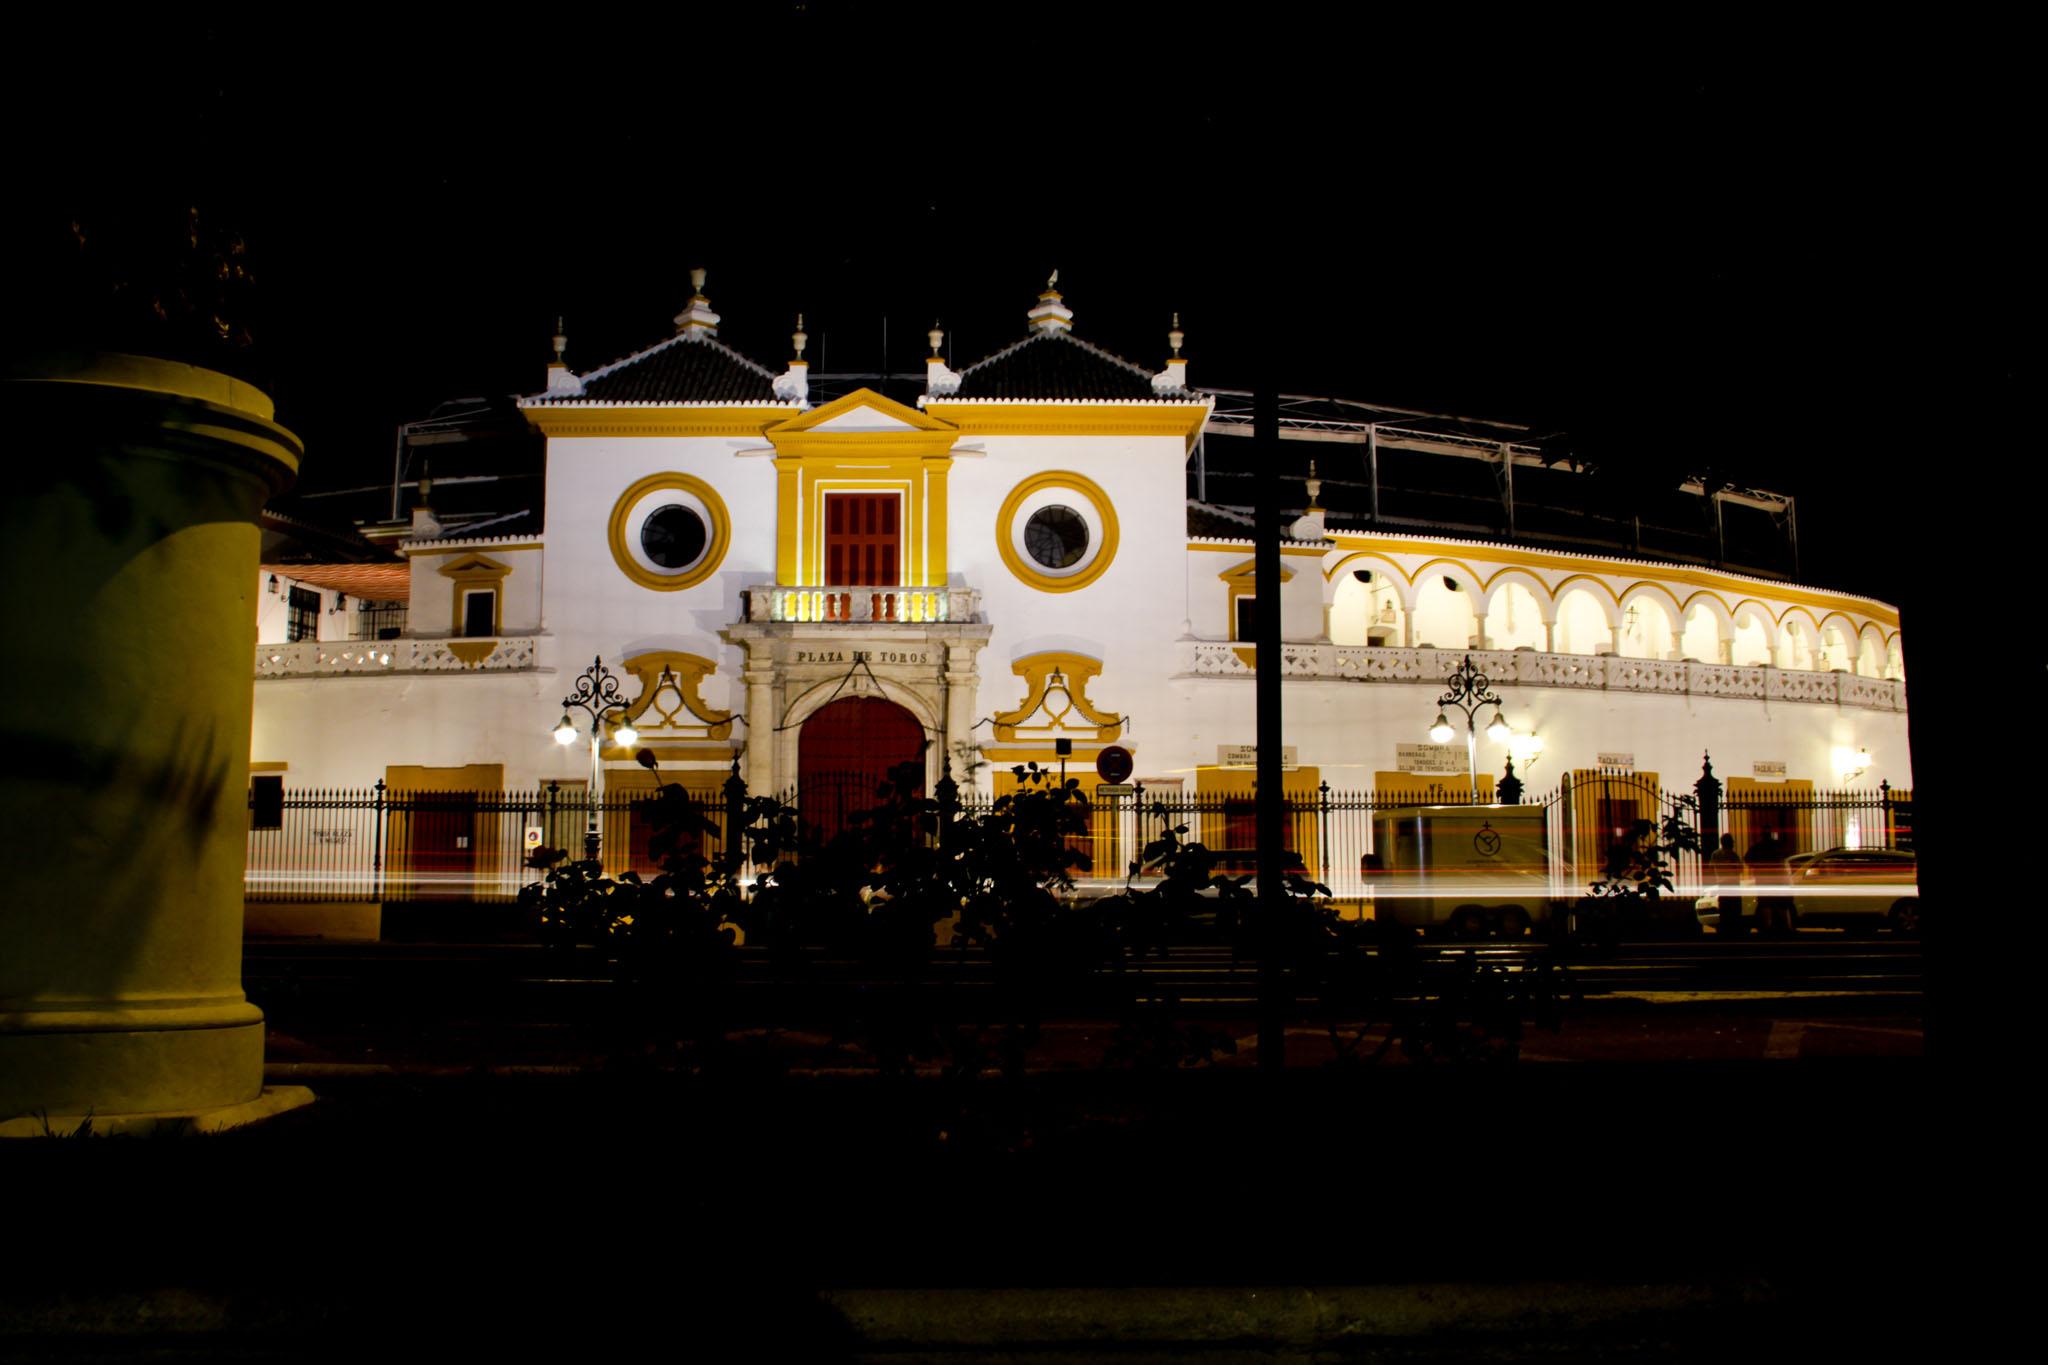 Plaza de los Toros, Sevilha